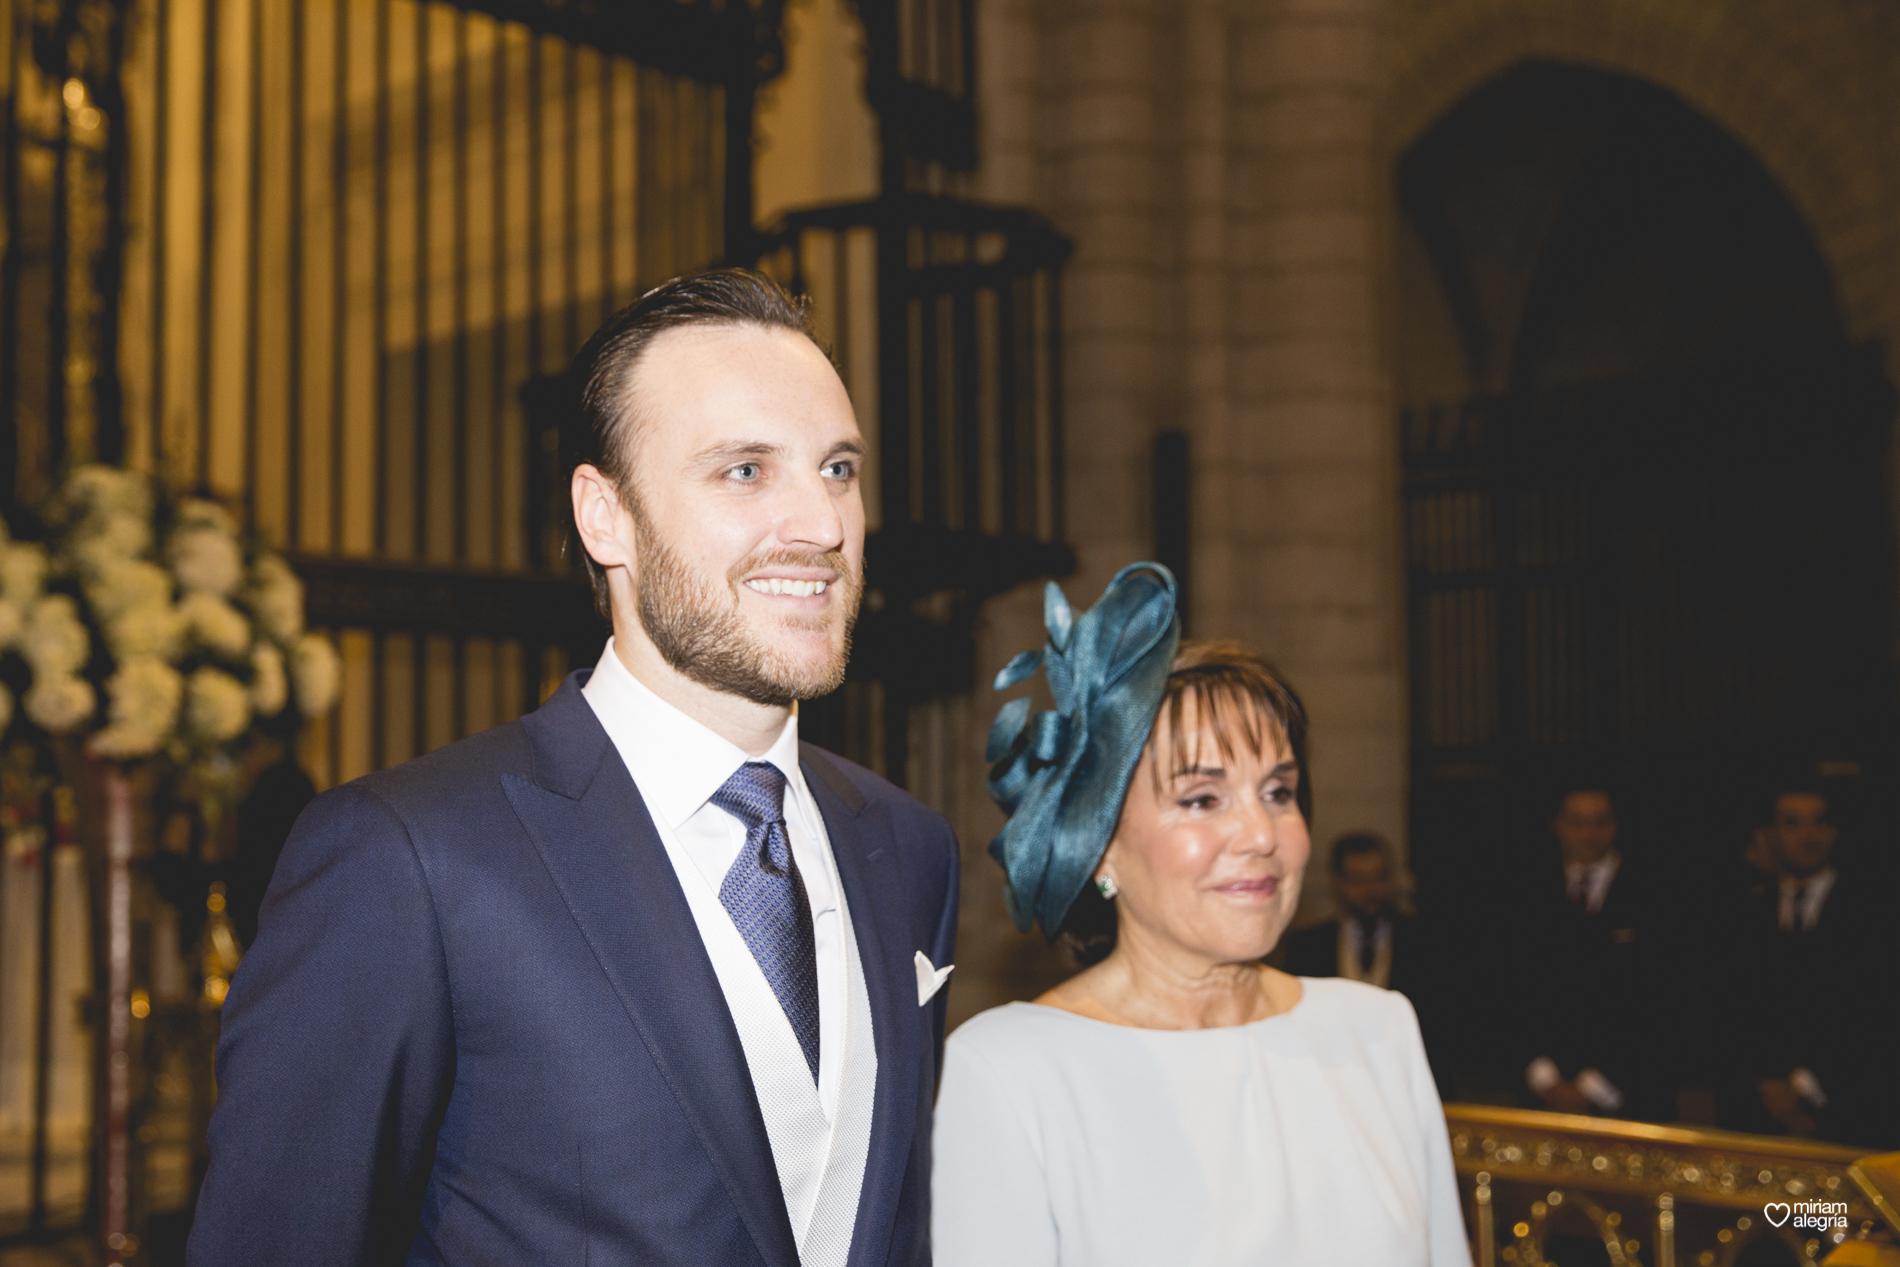 boda-en-la-catedral-de-murcia-miriam-alegria-fotografos-boda-murcia-36